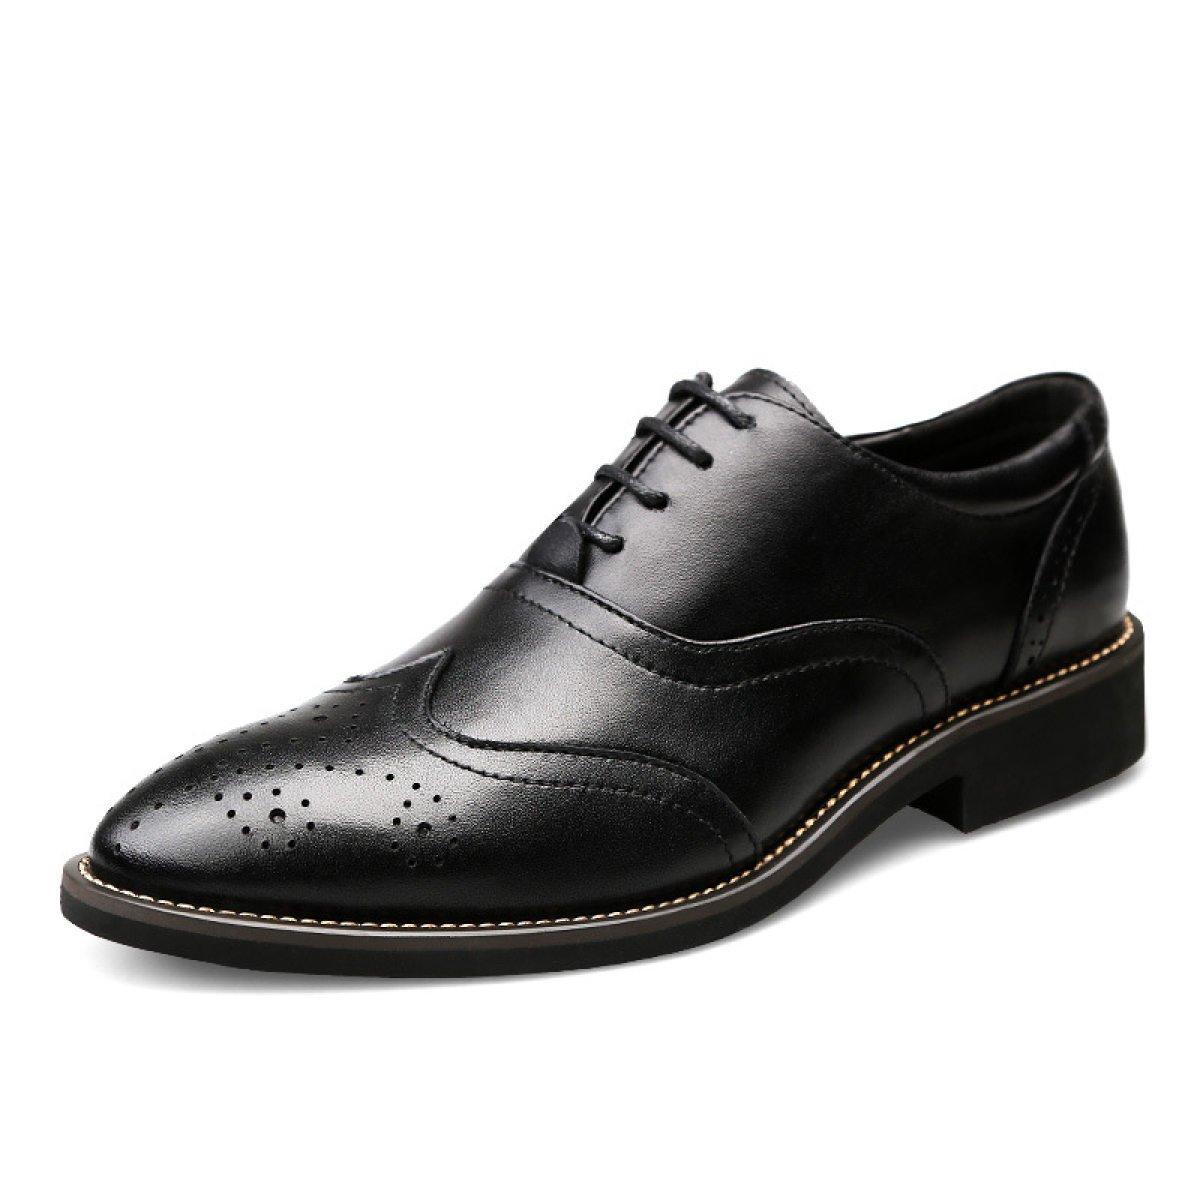 Herrenschuhe Arbeitsplatz Geschäft Schuhe Spitze Schuhe Spitze England Schuhe schwarz